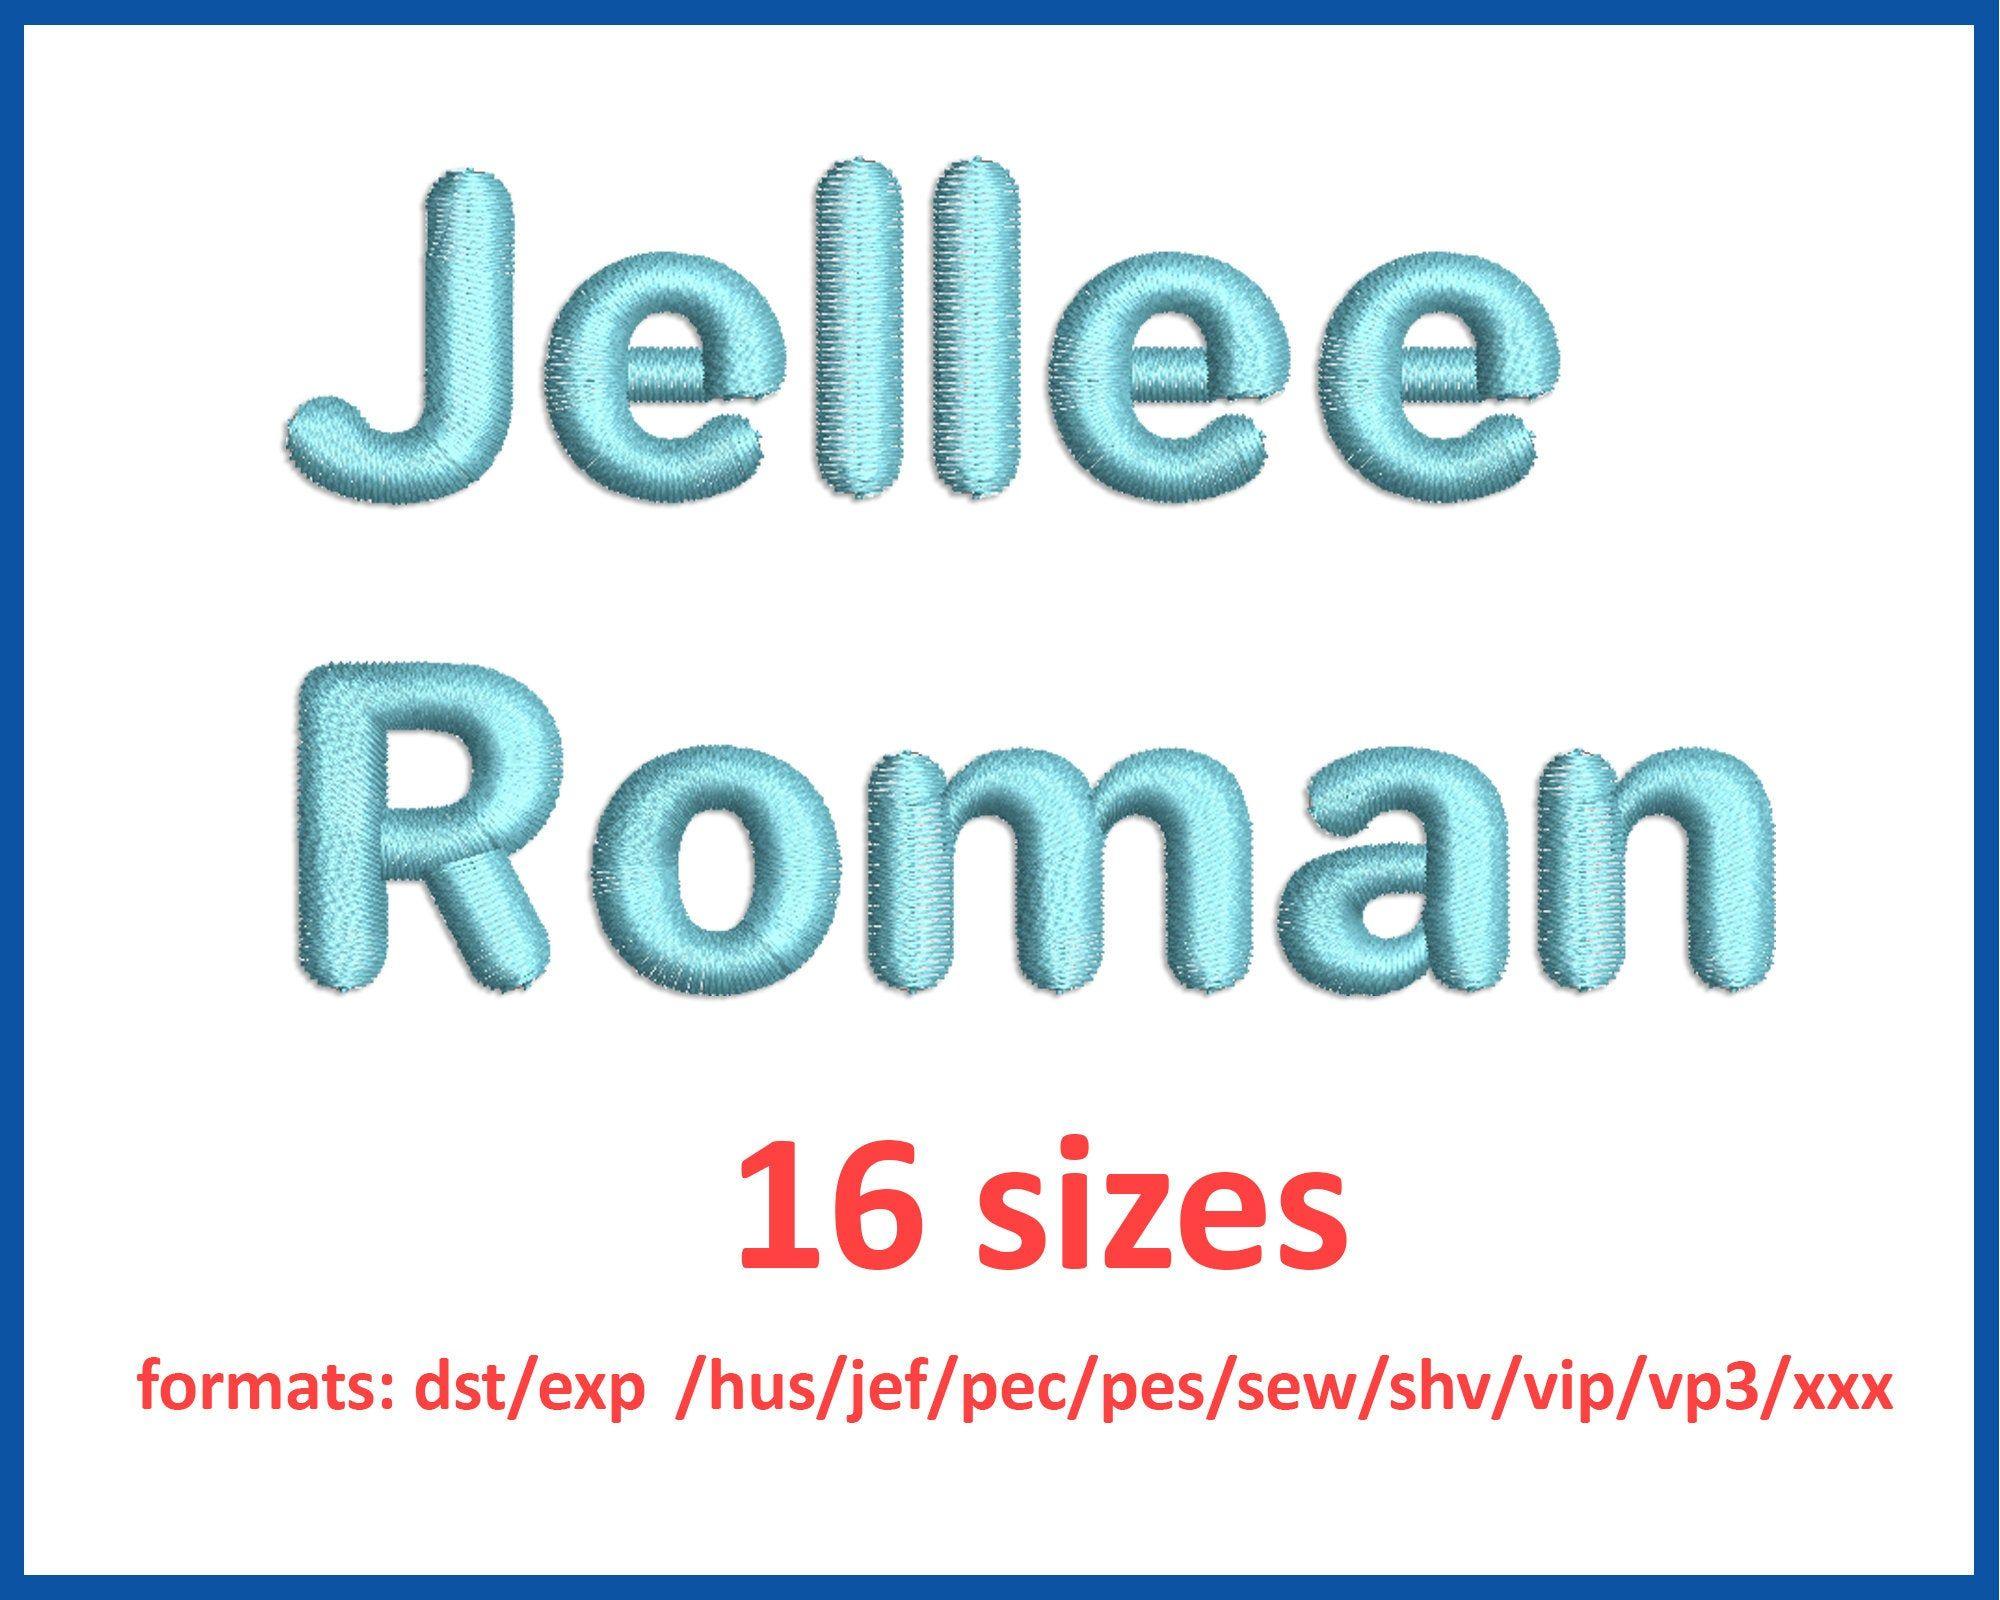 Jellee Roman font embroidery design 0.25, 0.5, 0.75, 1, 1